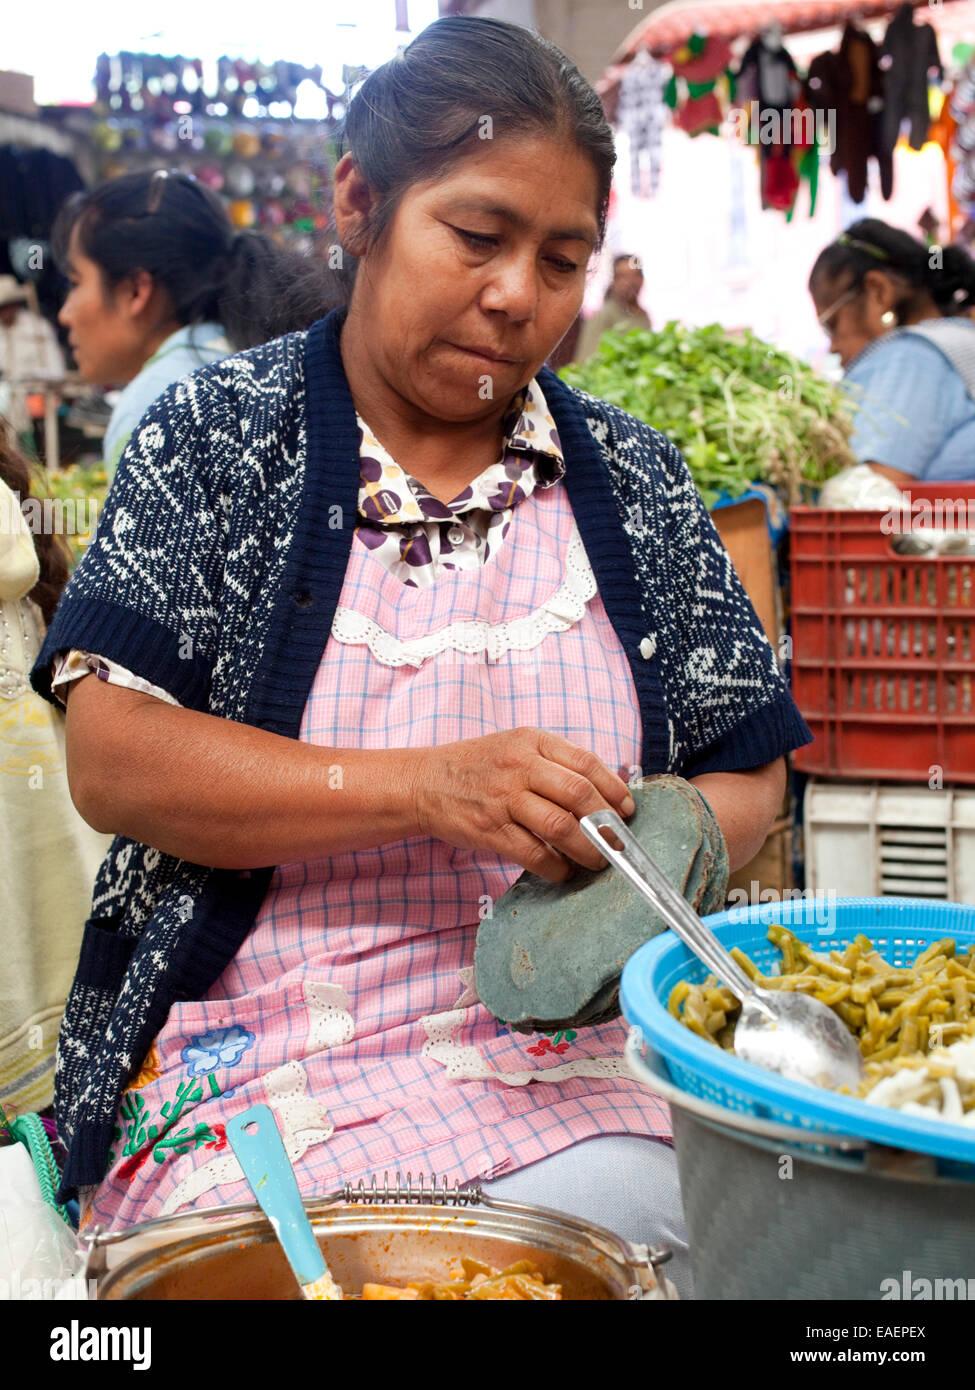 A woman peeling apart blue corn Tortillas at a market in Mexico - Stock Image